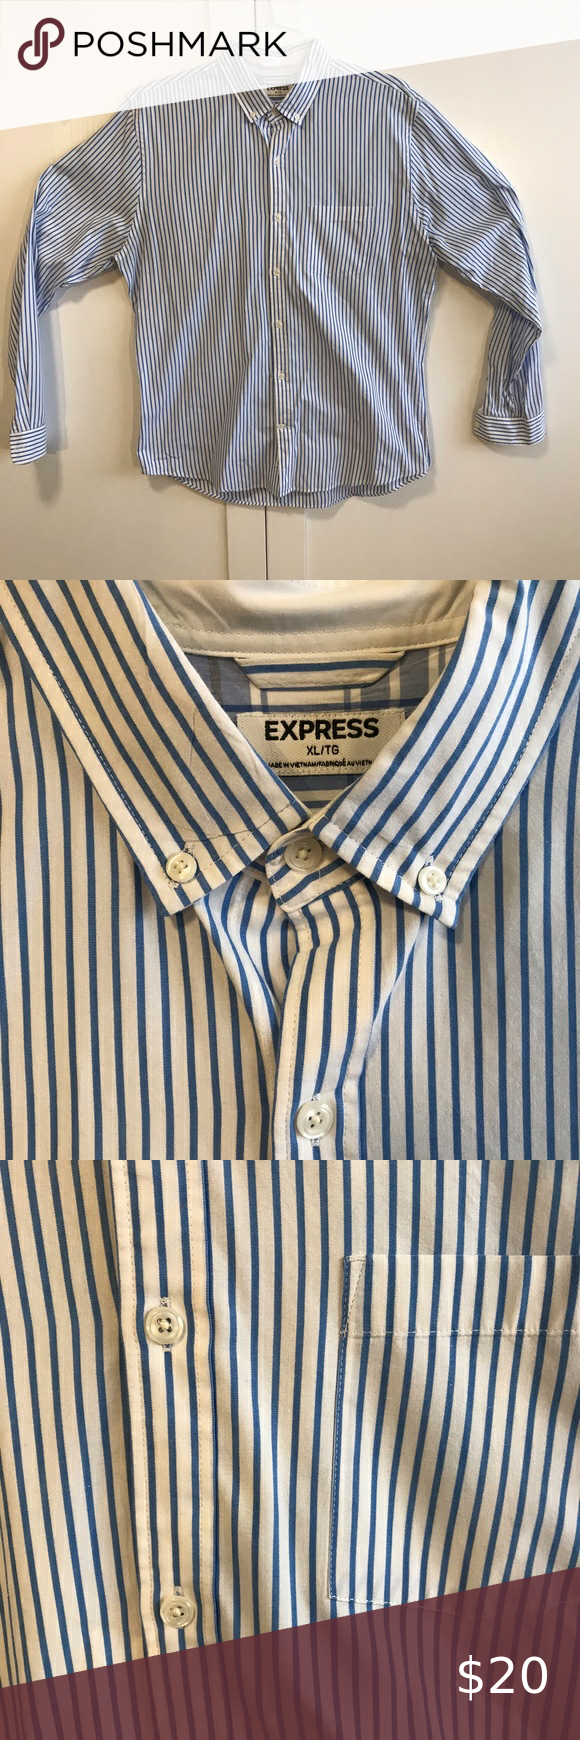 Express Men S Button Down Dress Shirt Express Men S Button Down Navy Blue And White Striped Dress Shirt Excell Shirt Dress Mens Shirt Dress Button Down Dress [ 1740 x 580 Pixel ]